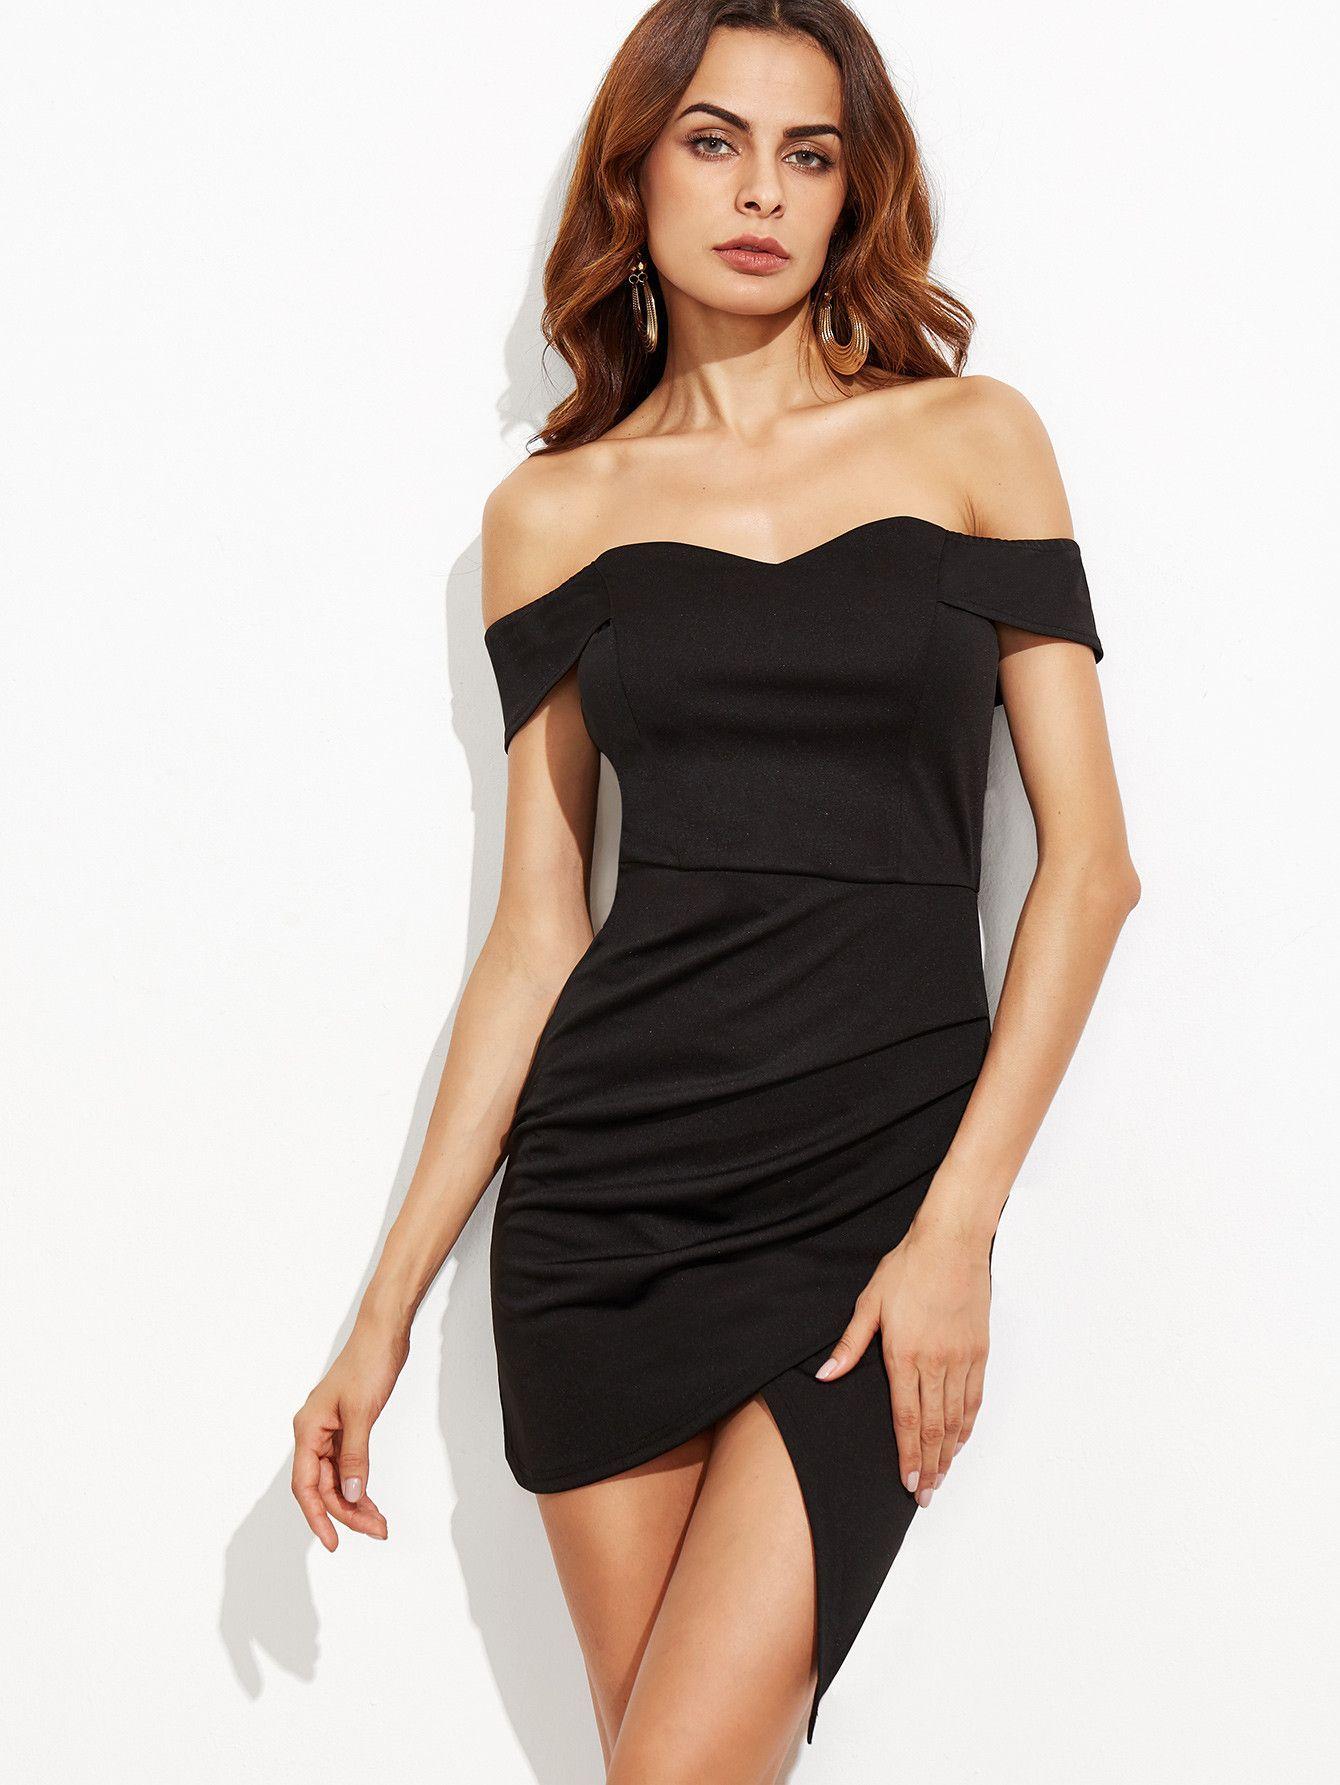 a66ae3485c4d39 Description Fabric: Fabric is very stretchy Season: Summer Pattern Type:  Plain Sleeve Length: Short Sleeve Color: Black Dresses Length: Mini Style:  Party ...